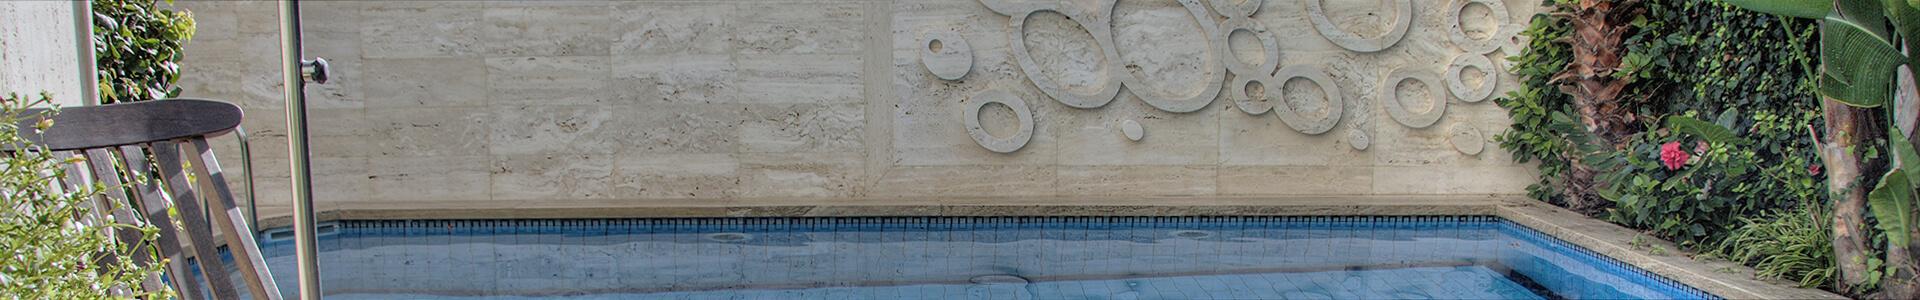 murals-slider